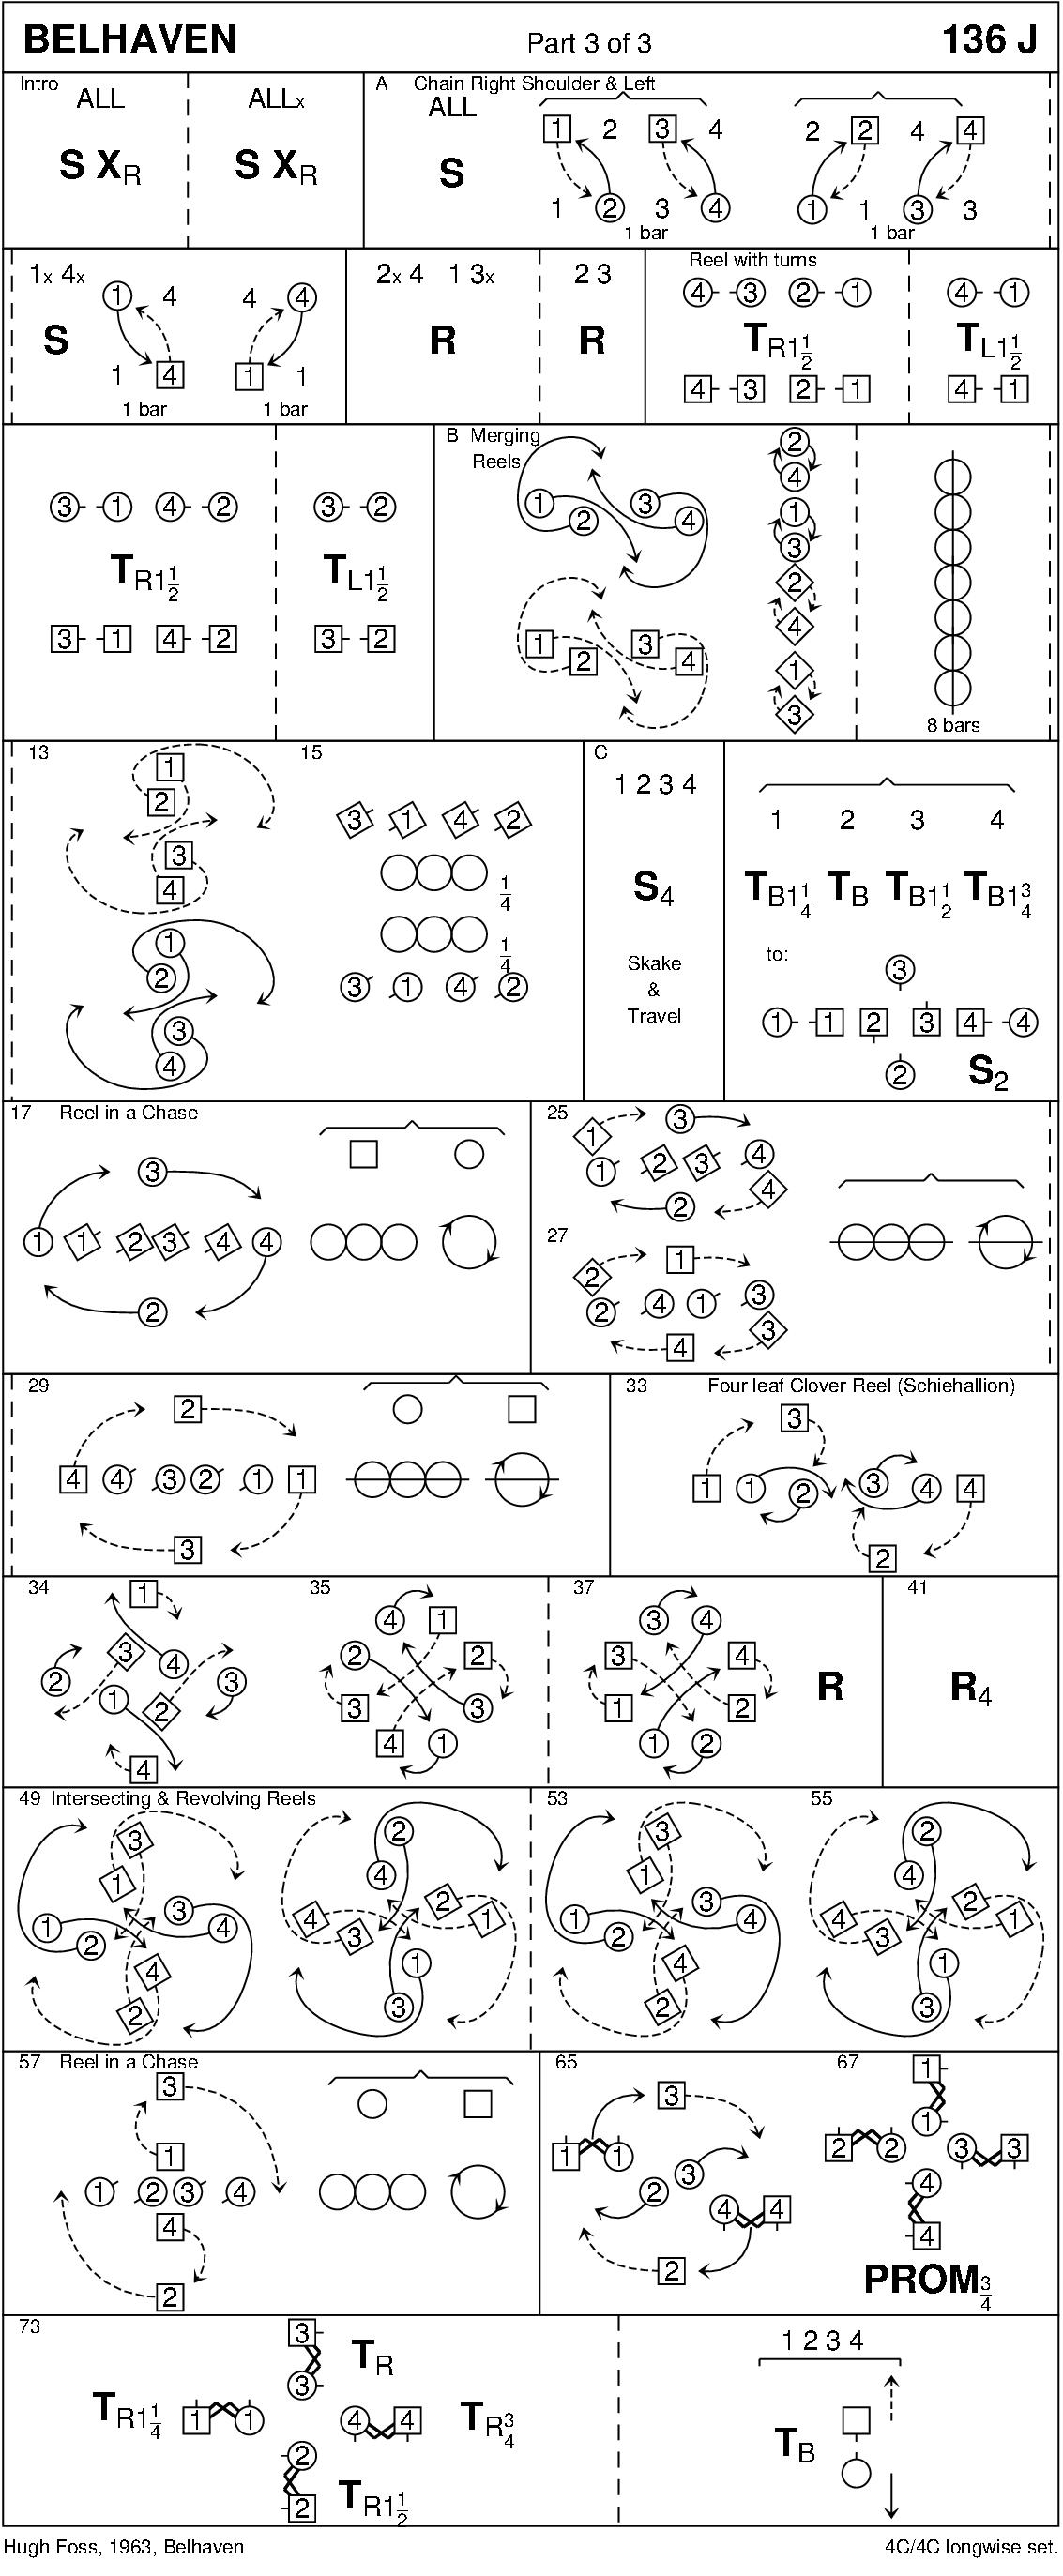 Belhaven (Jig) Keith Rose's Diagram